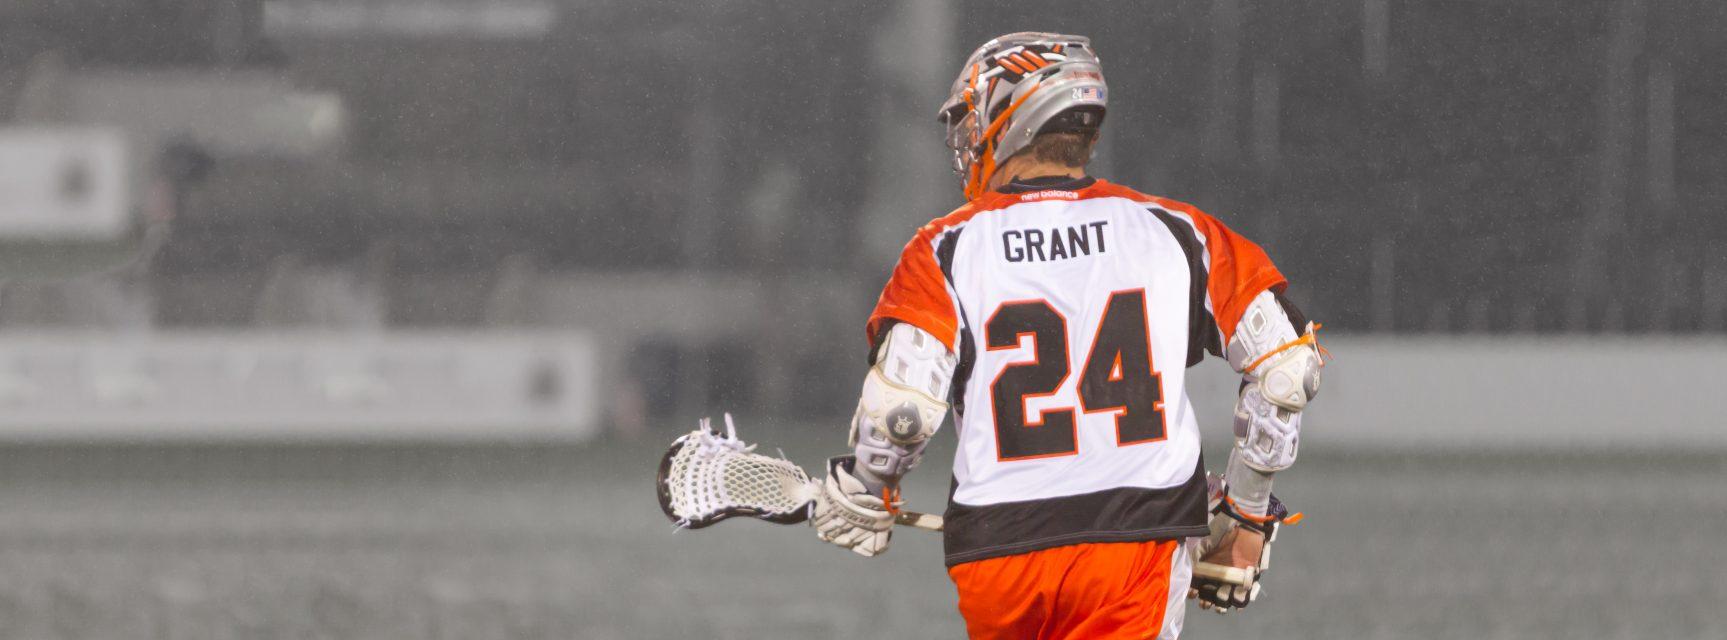 StringKing Lacrosse Pro John Grant Jr Retirement